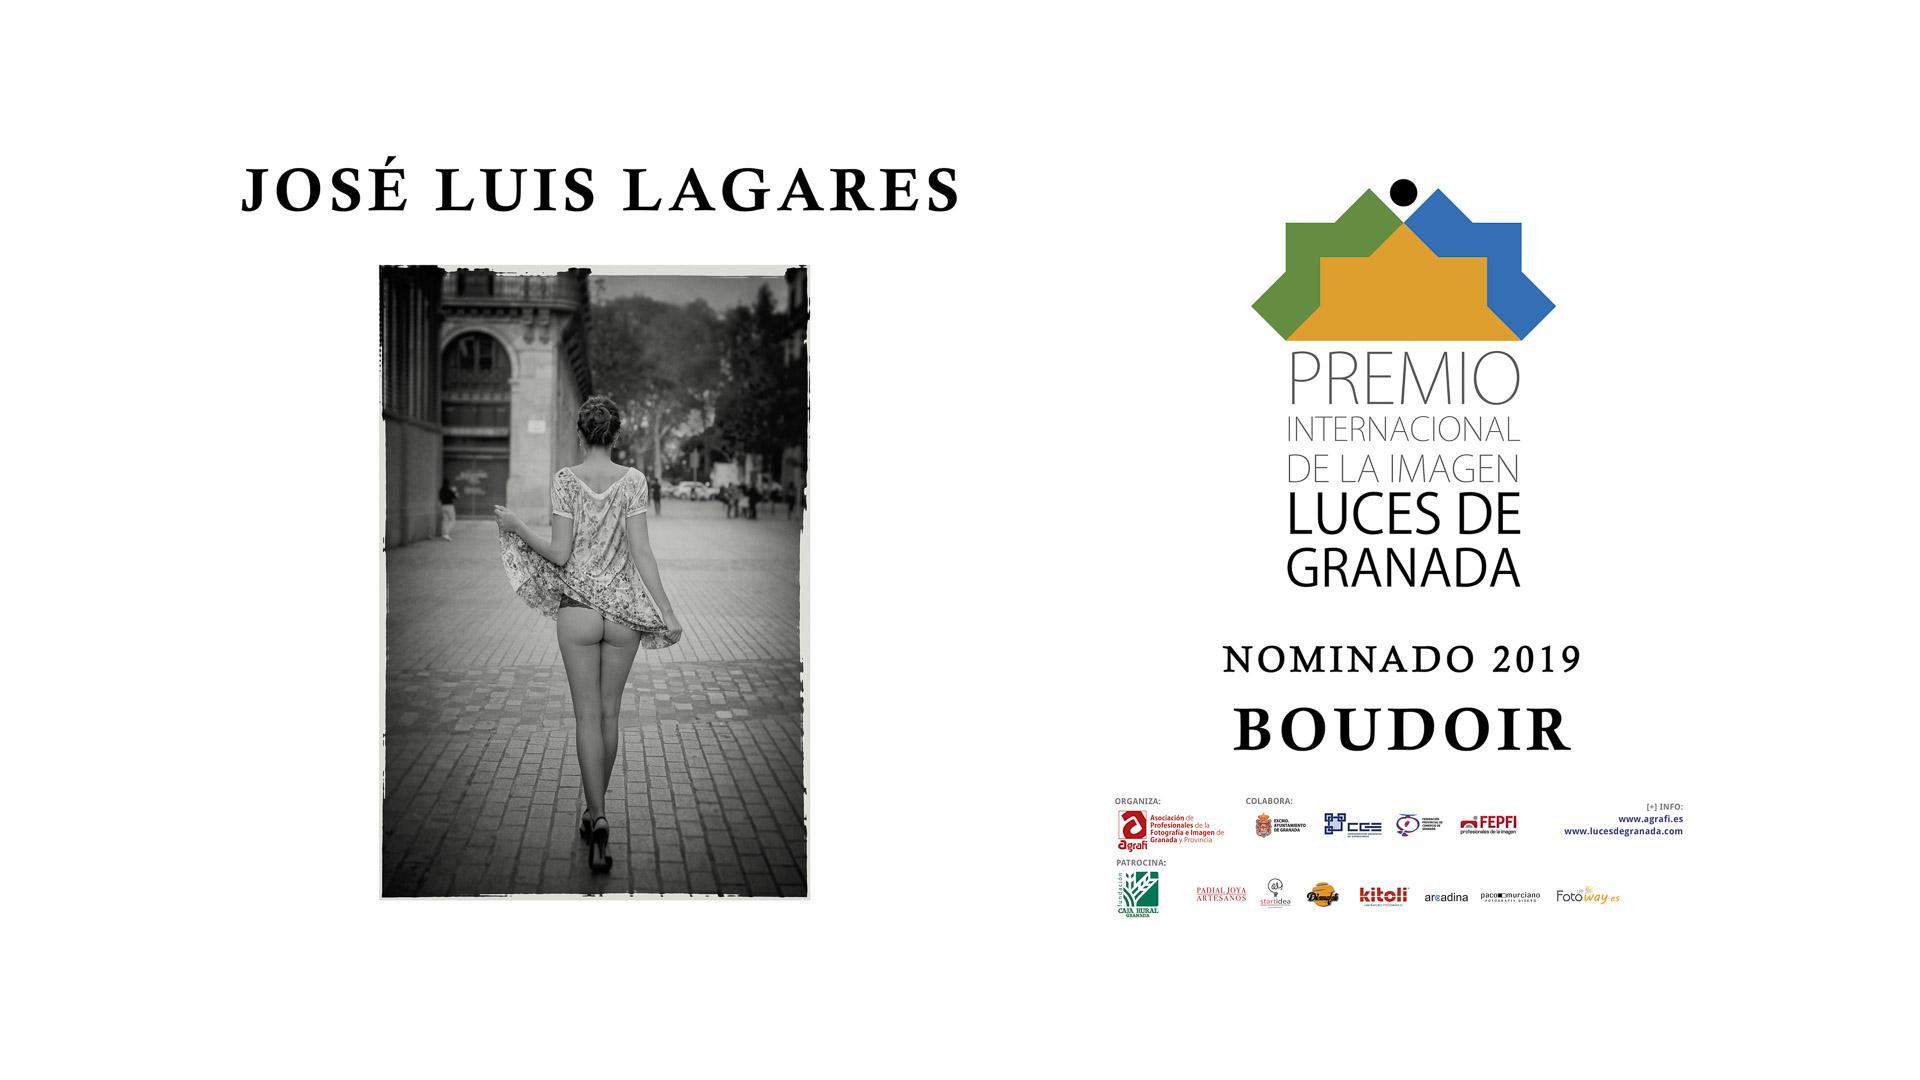 BD03_JOSE LUIS LAGARES